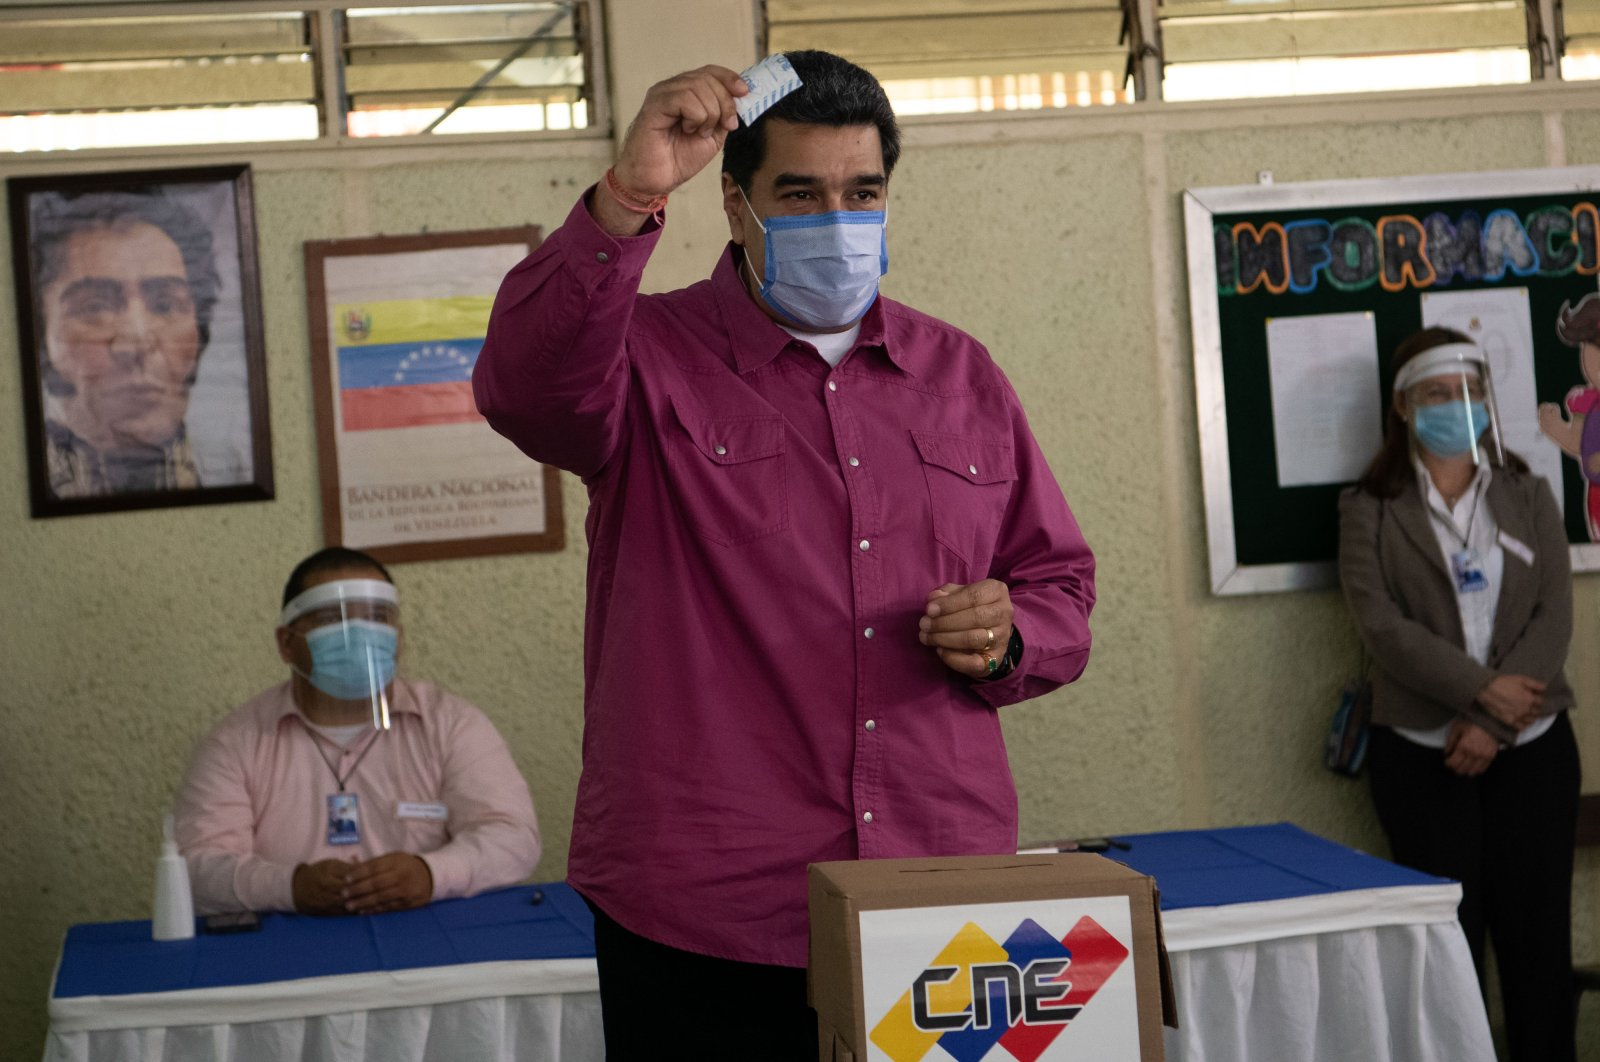 Venezuelan President Nicolas Maduro casts his vote, Caracas, Dec. 6, 2020. (AA Photo)